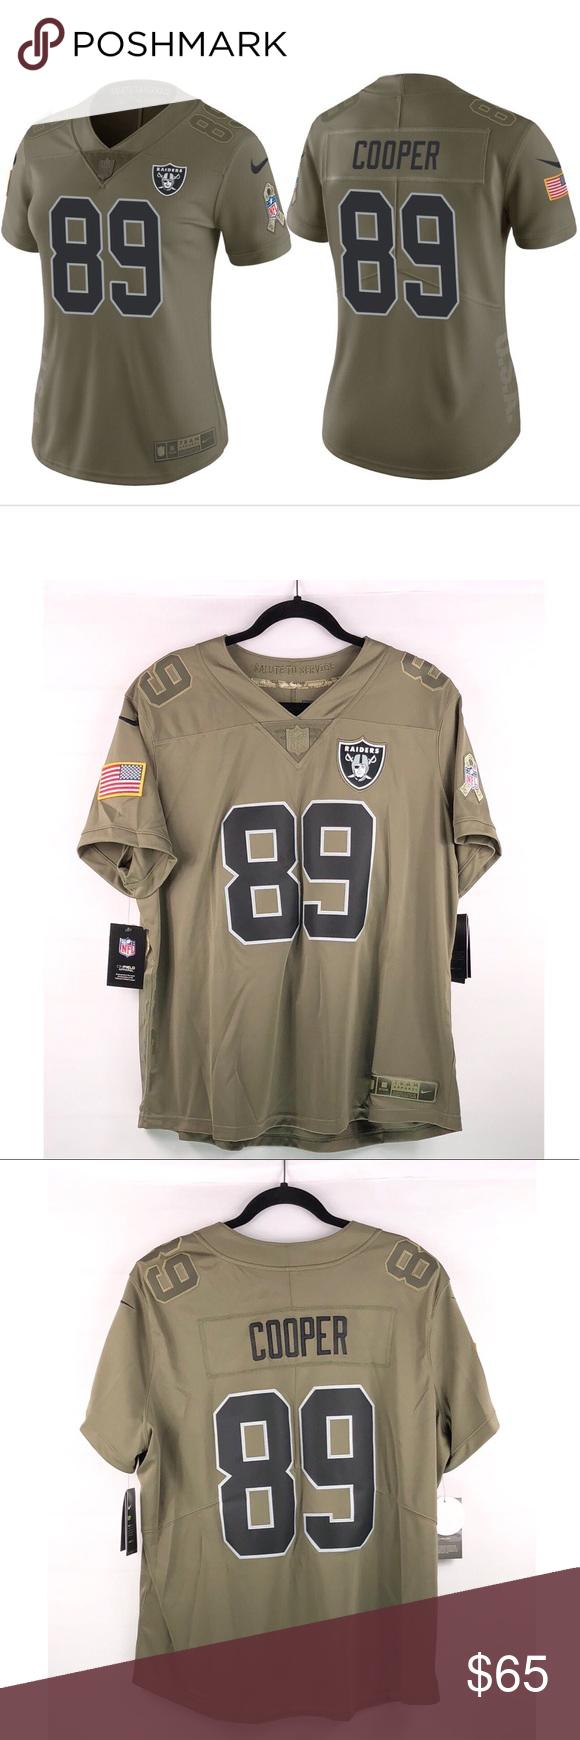 Nike NFL Raiders Jersey Amari Cooper  89 NWT en 2018  9f337f225